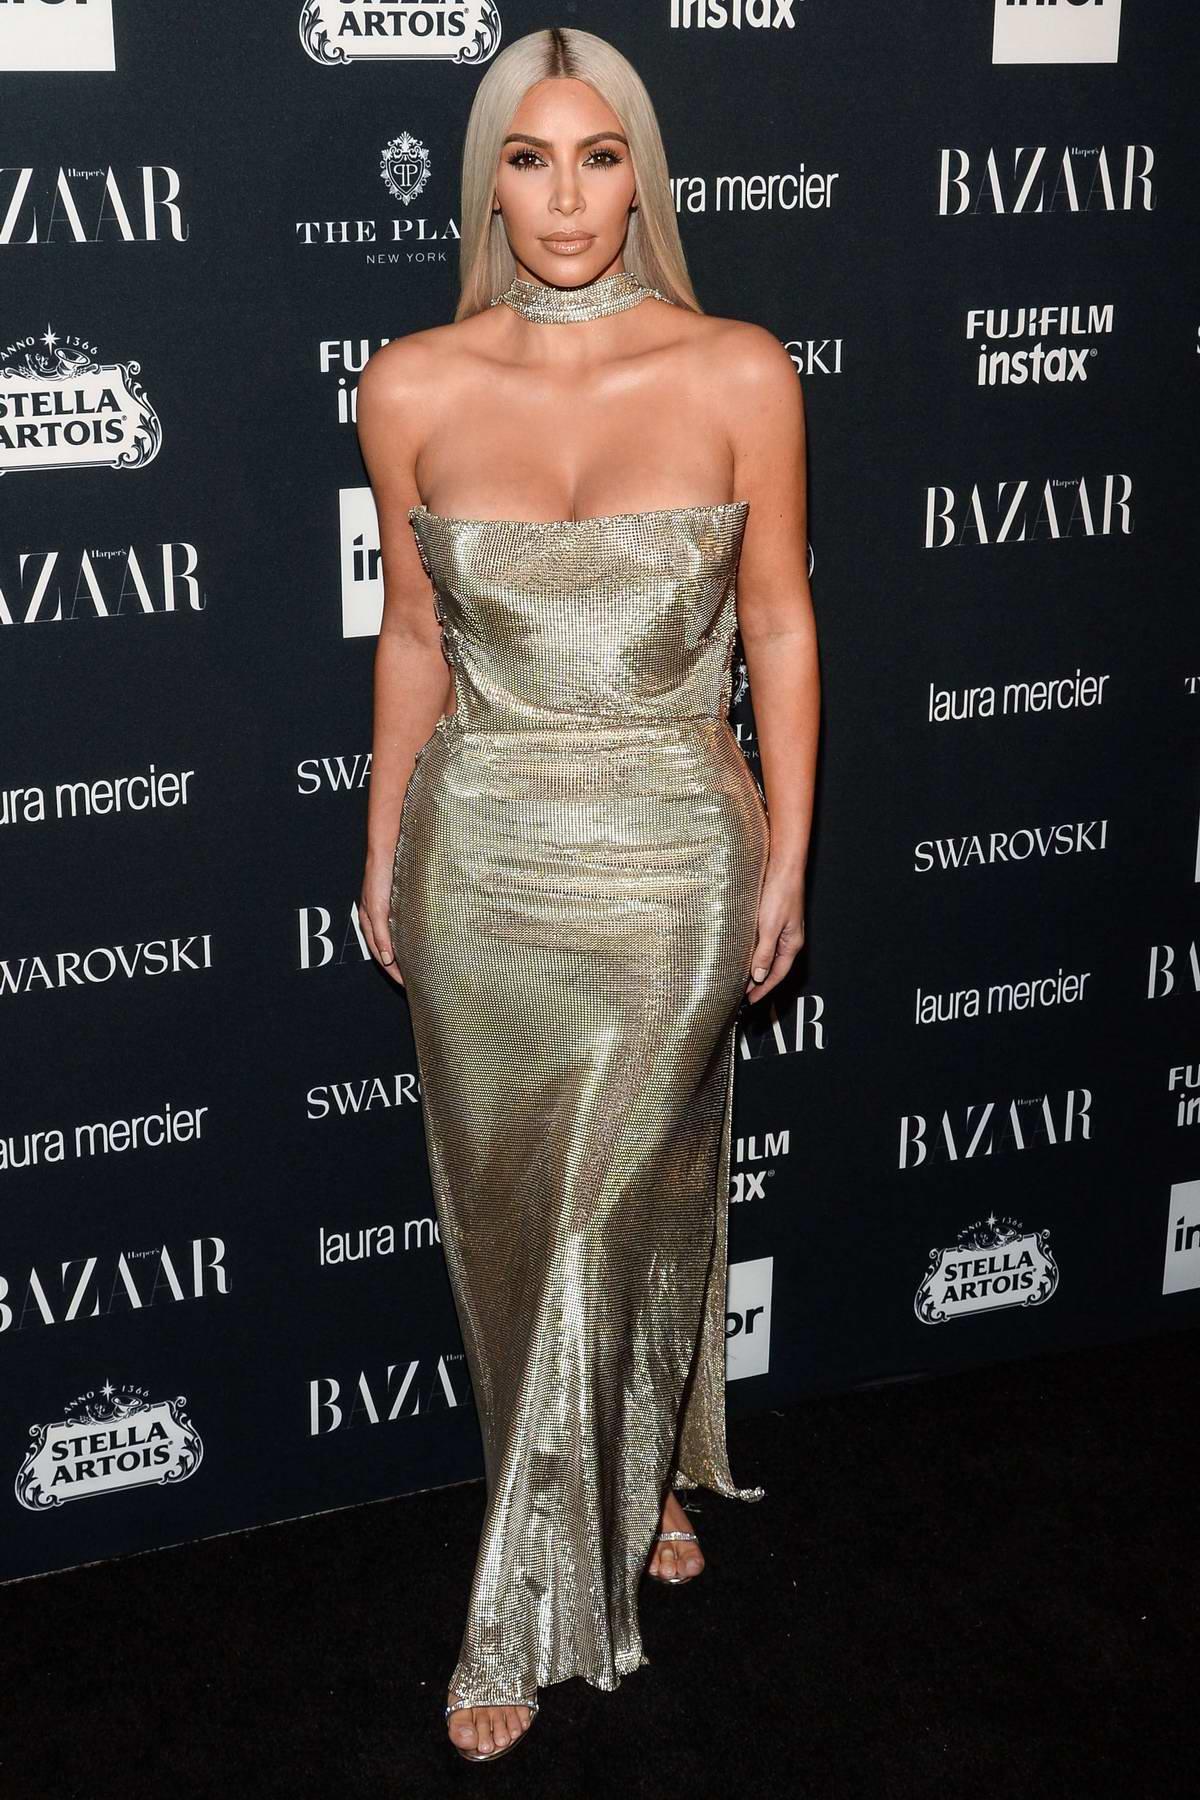 Kim Kardashian at the Harper's Bazaar ICONS party at New York Fashion Week